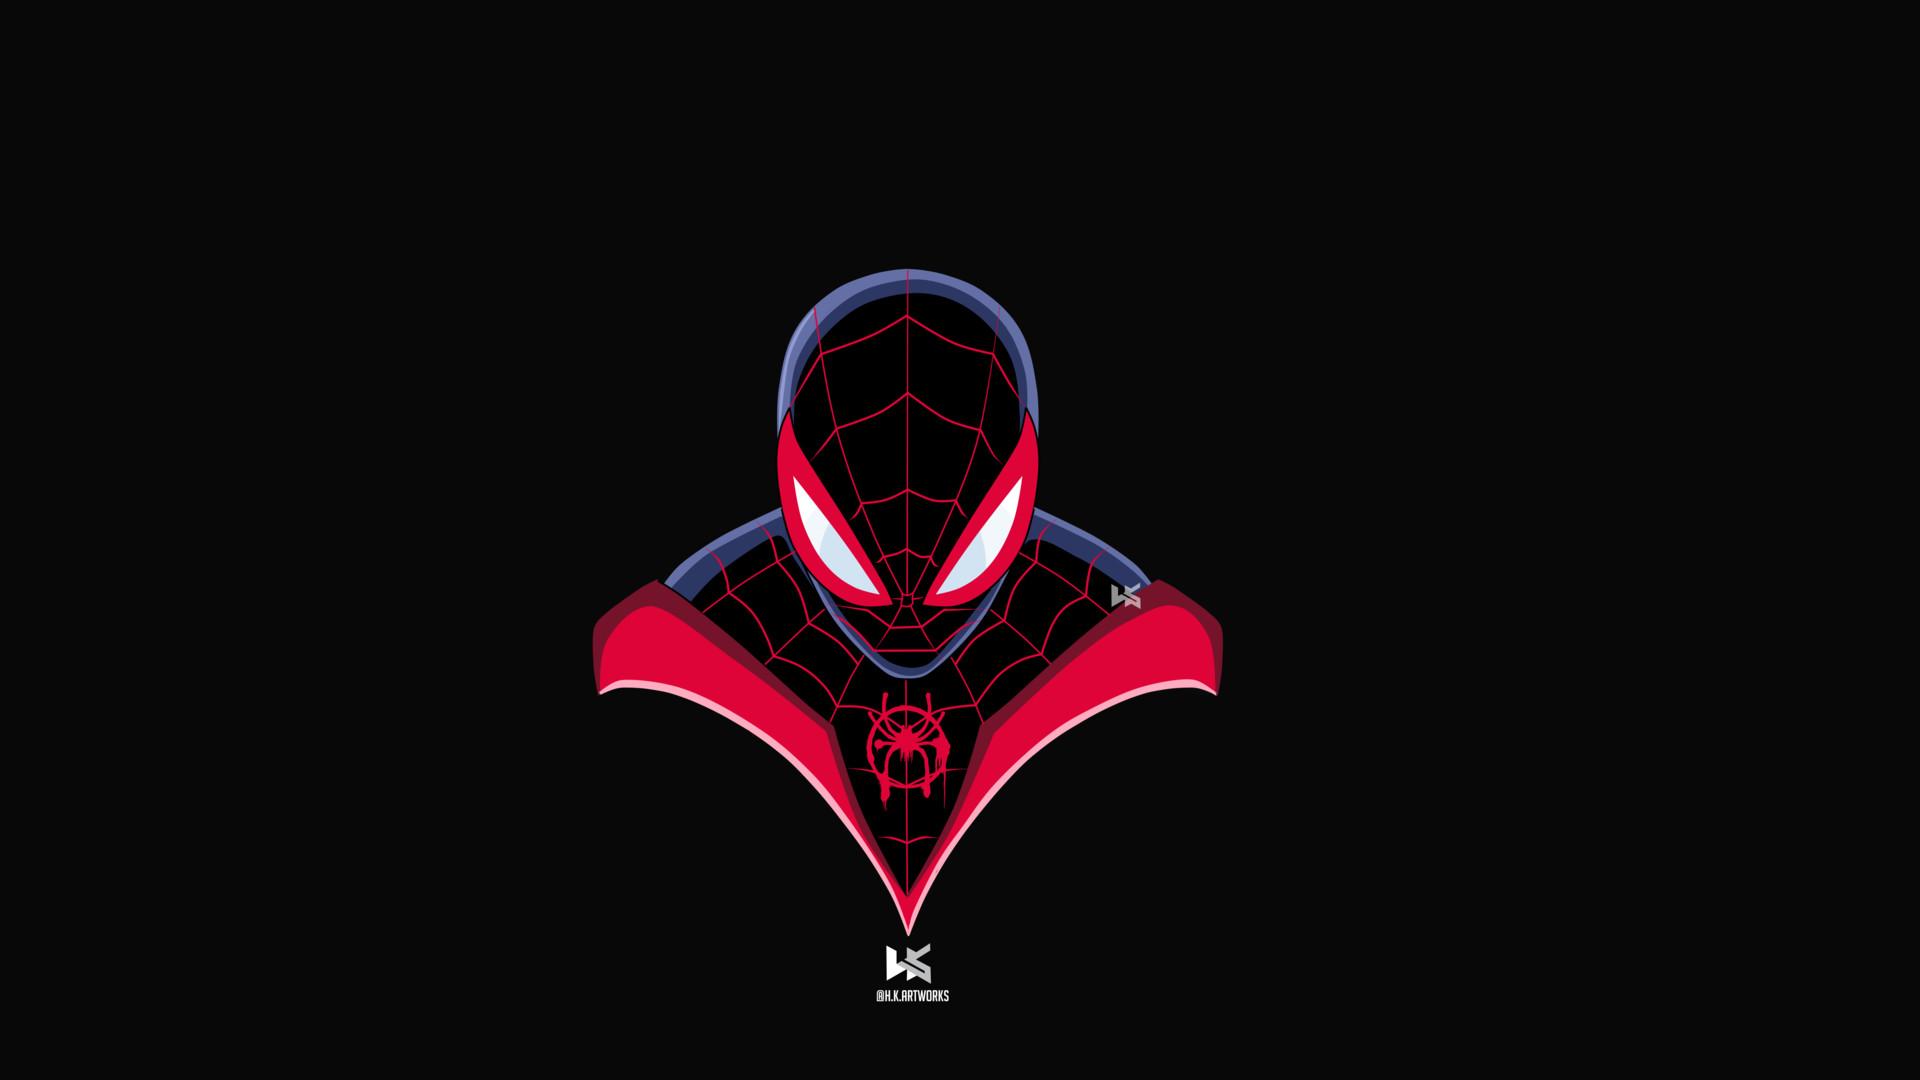 spiderman symbol hd wallpaper labzada wallpaper